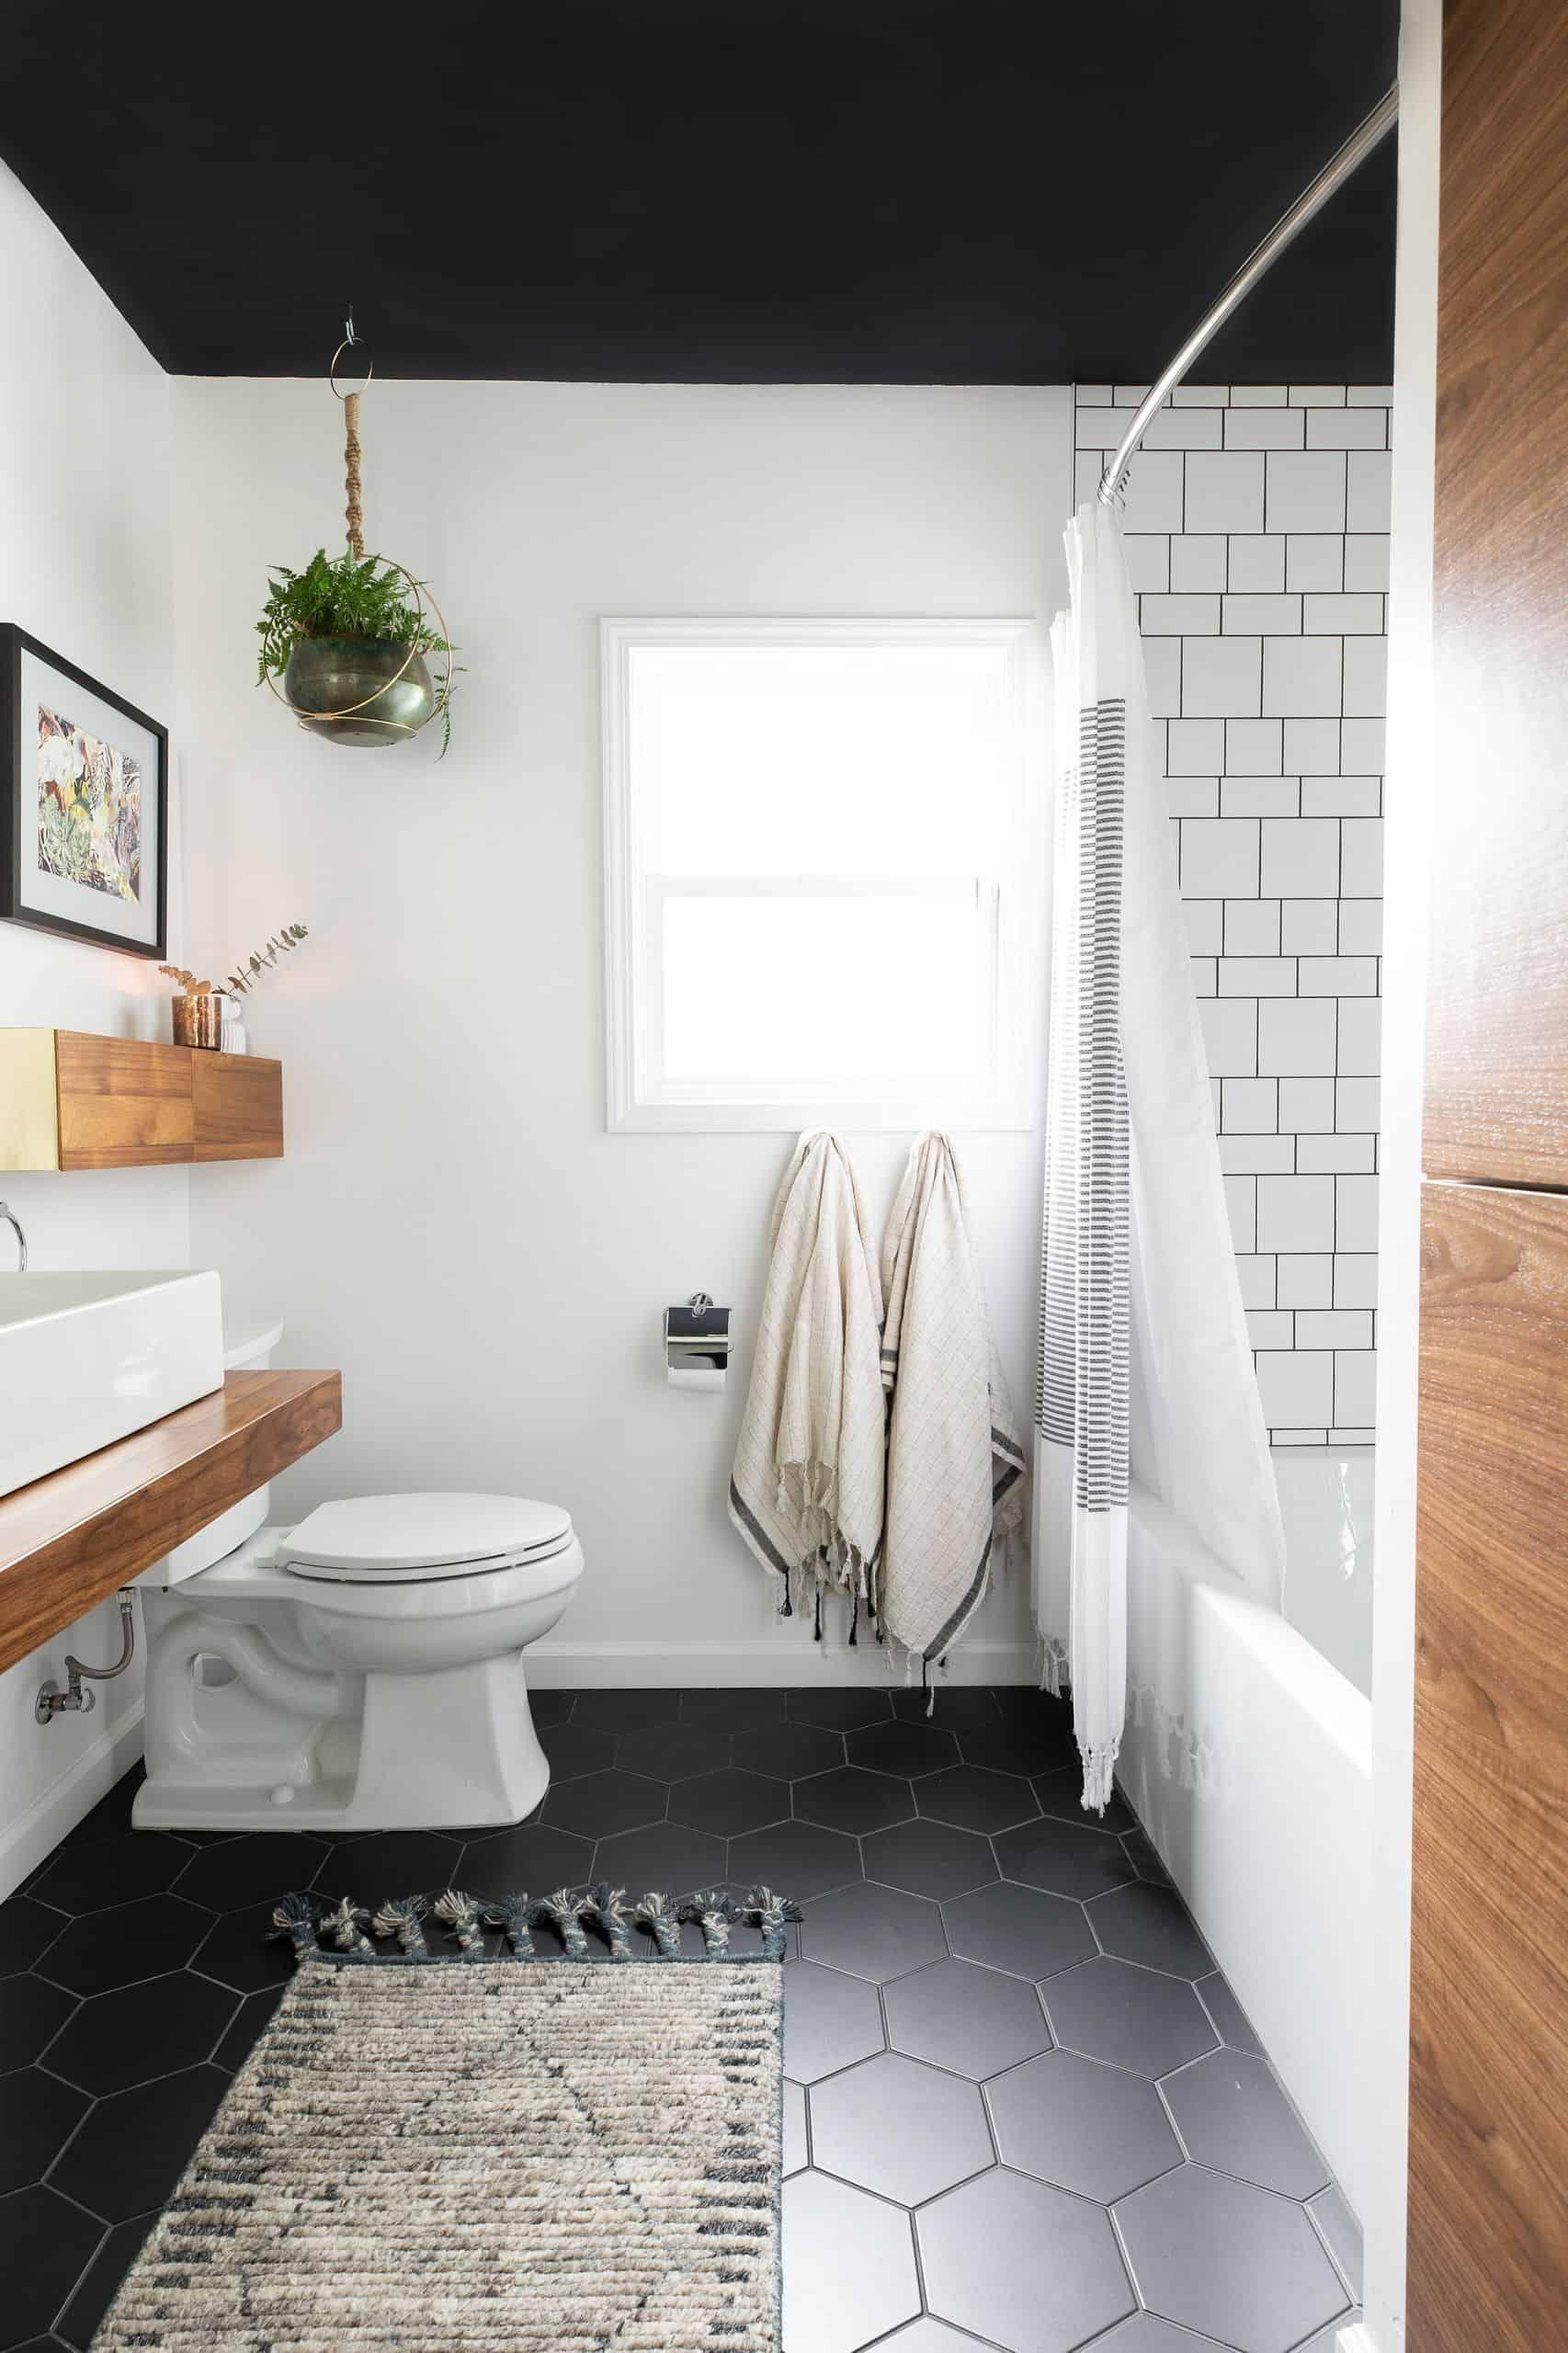 Top 28 Best Small Bathroom Ideas With Bathtubs For 2020 In 2020 Modern Contemporary Bathrooms Mid Century Modern Bathroom Bathroom Color Schemes